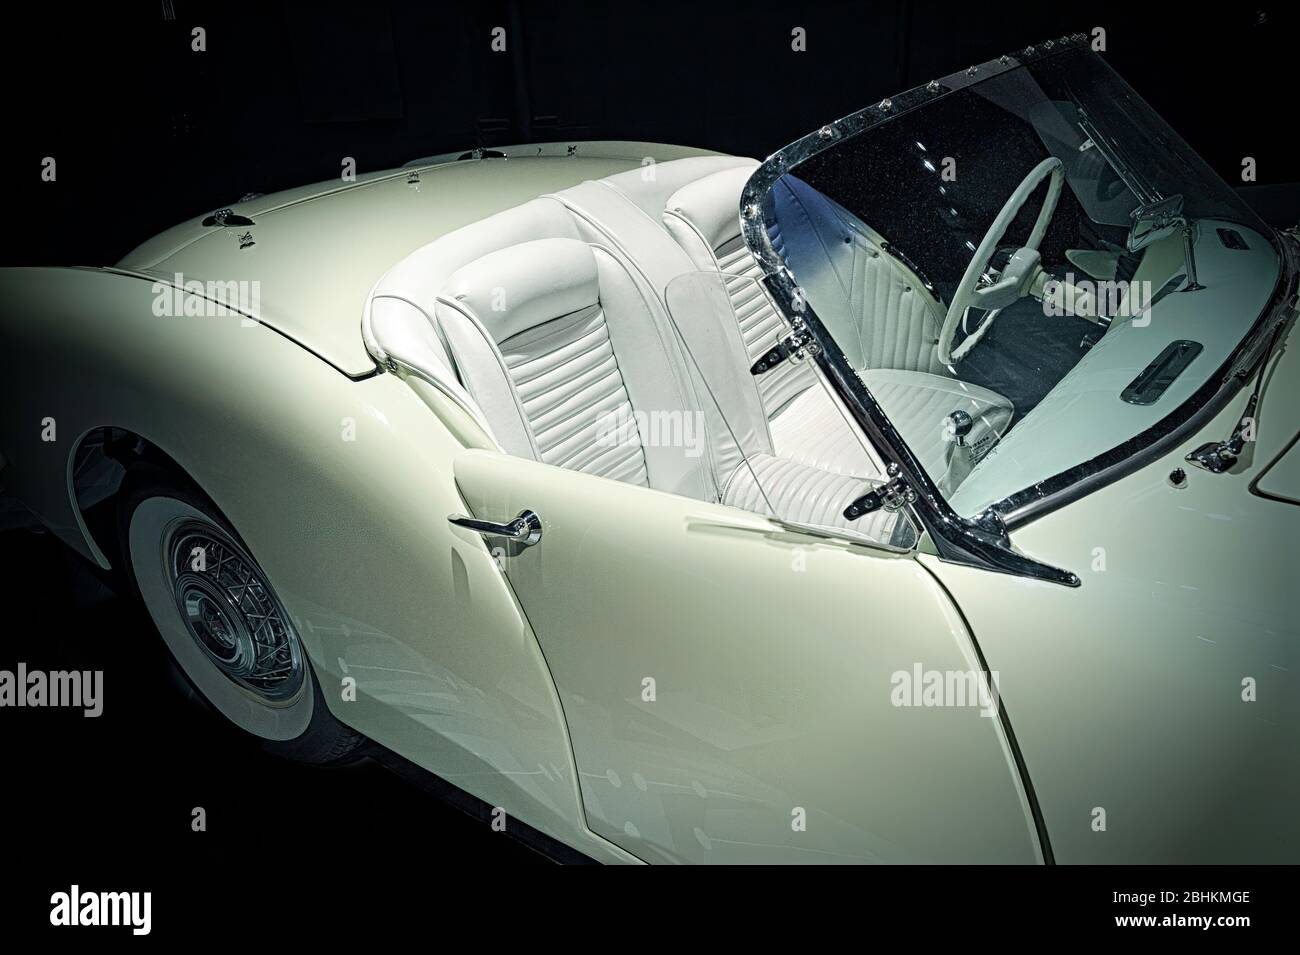 a-1954-kaiser-darrin-american-convertible-vintage-car-2BHKMGE.jpg